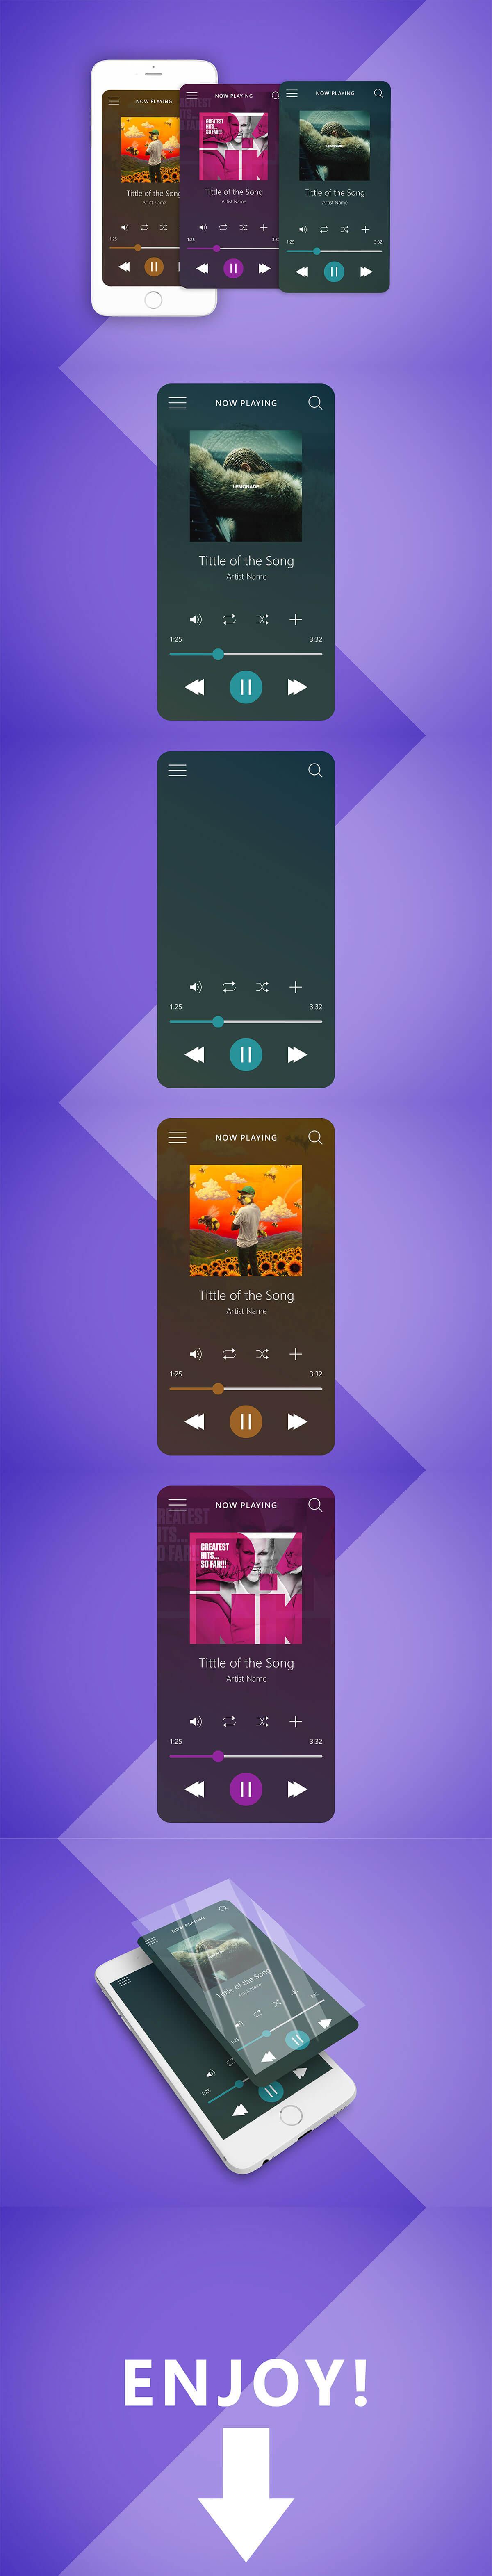 Free Music Player Interface UI Mockup ~ Creativetacos